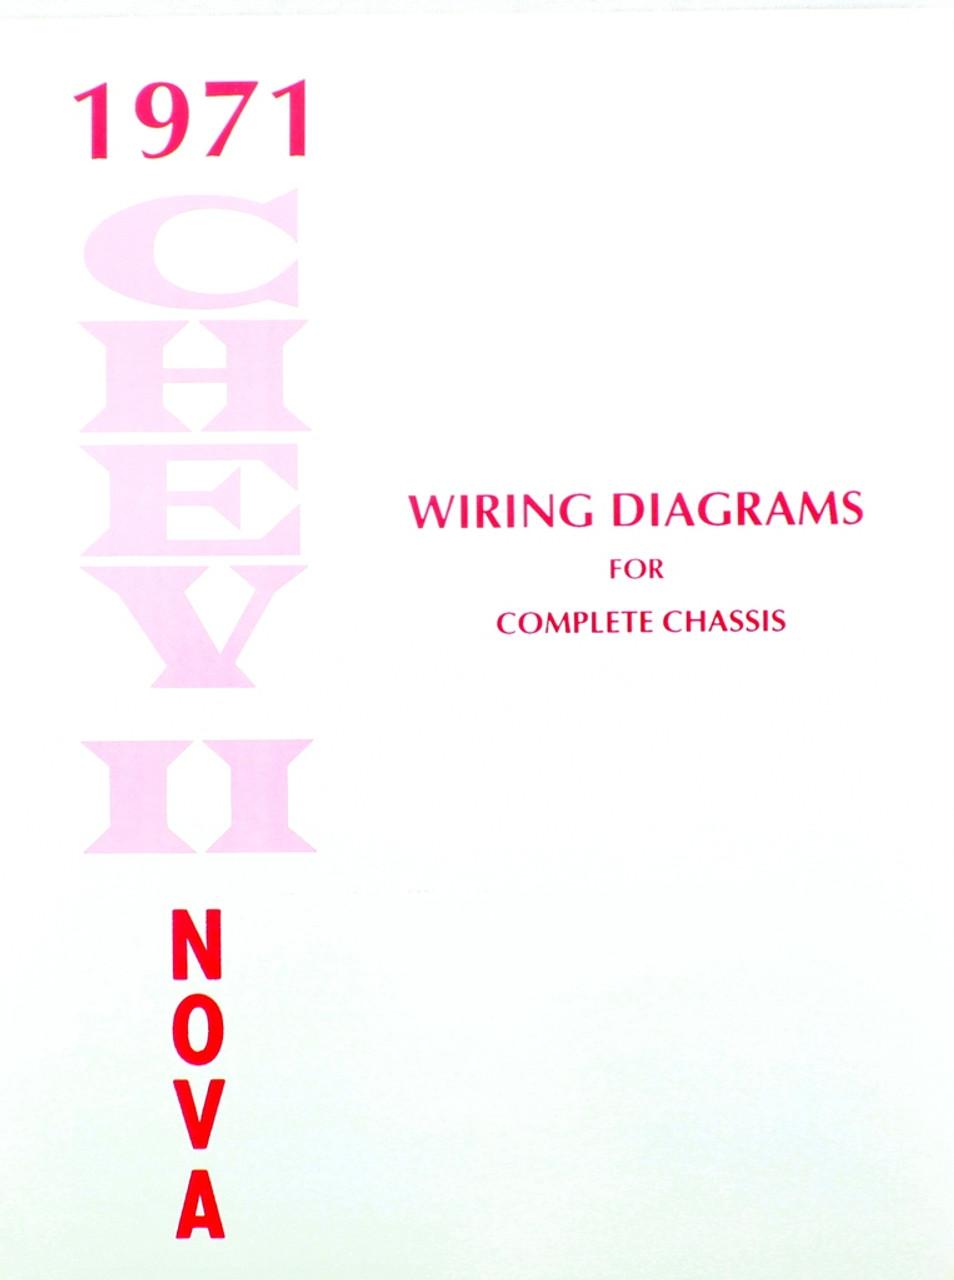 71 1971 CHEVY NOVA ELECTRICAL WIRING DIAGRAM MANUAL  I5